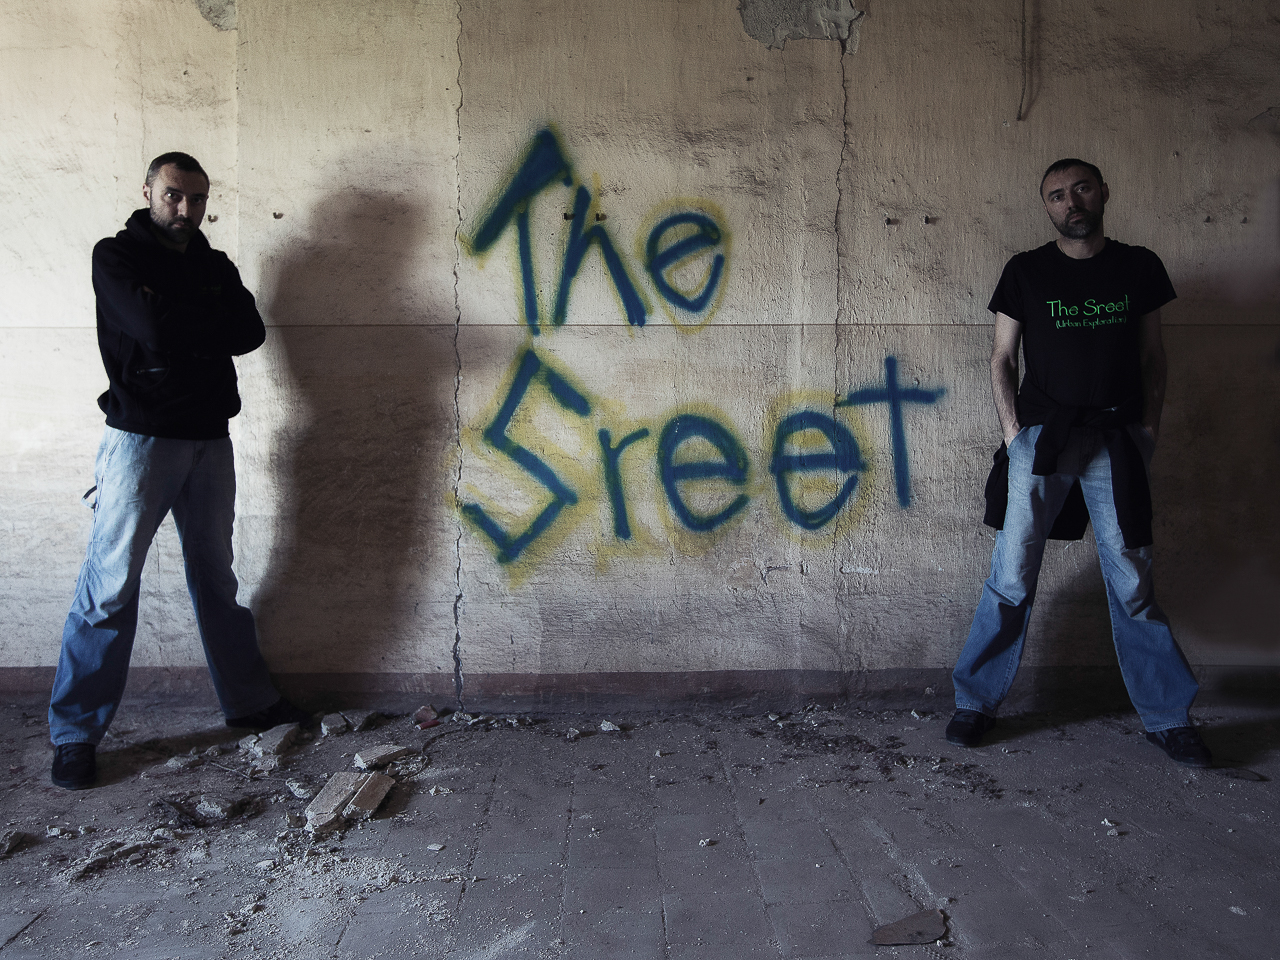 The Sreet